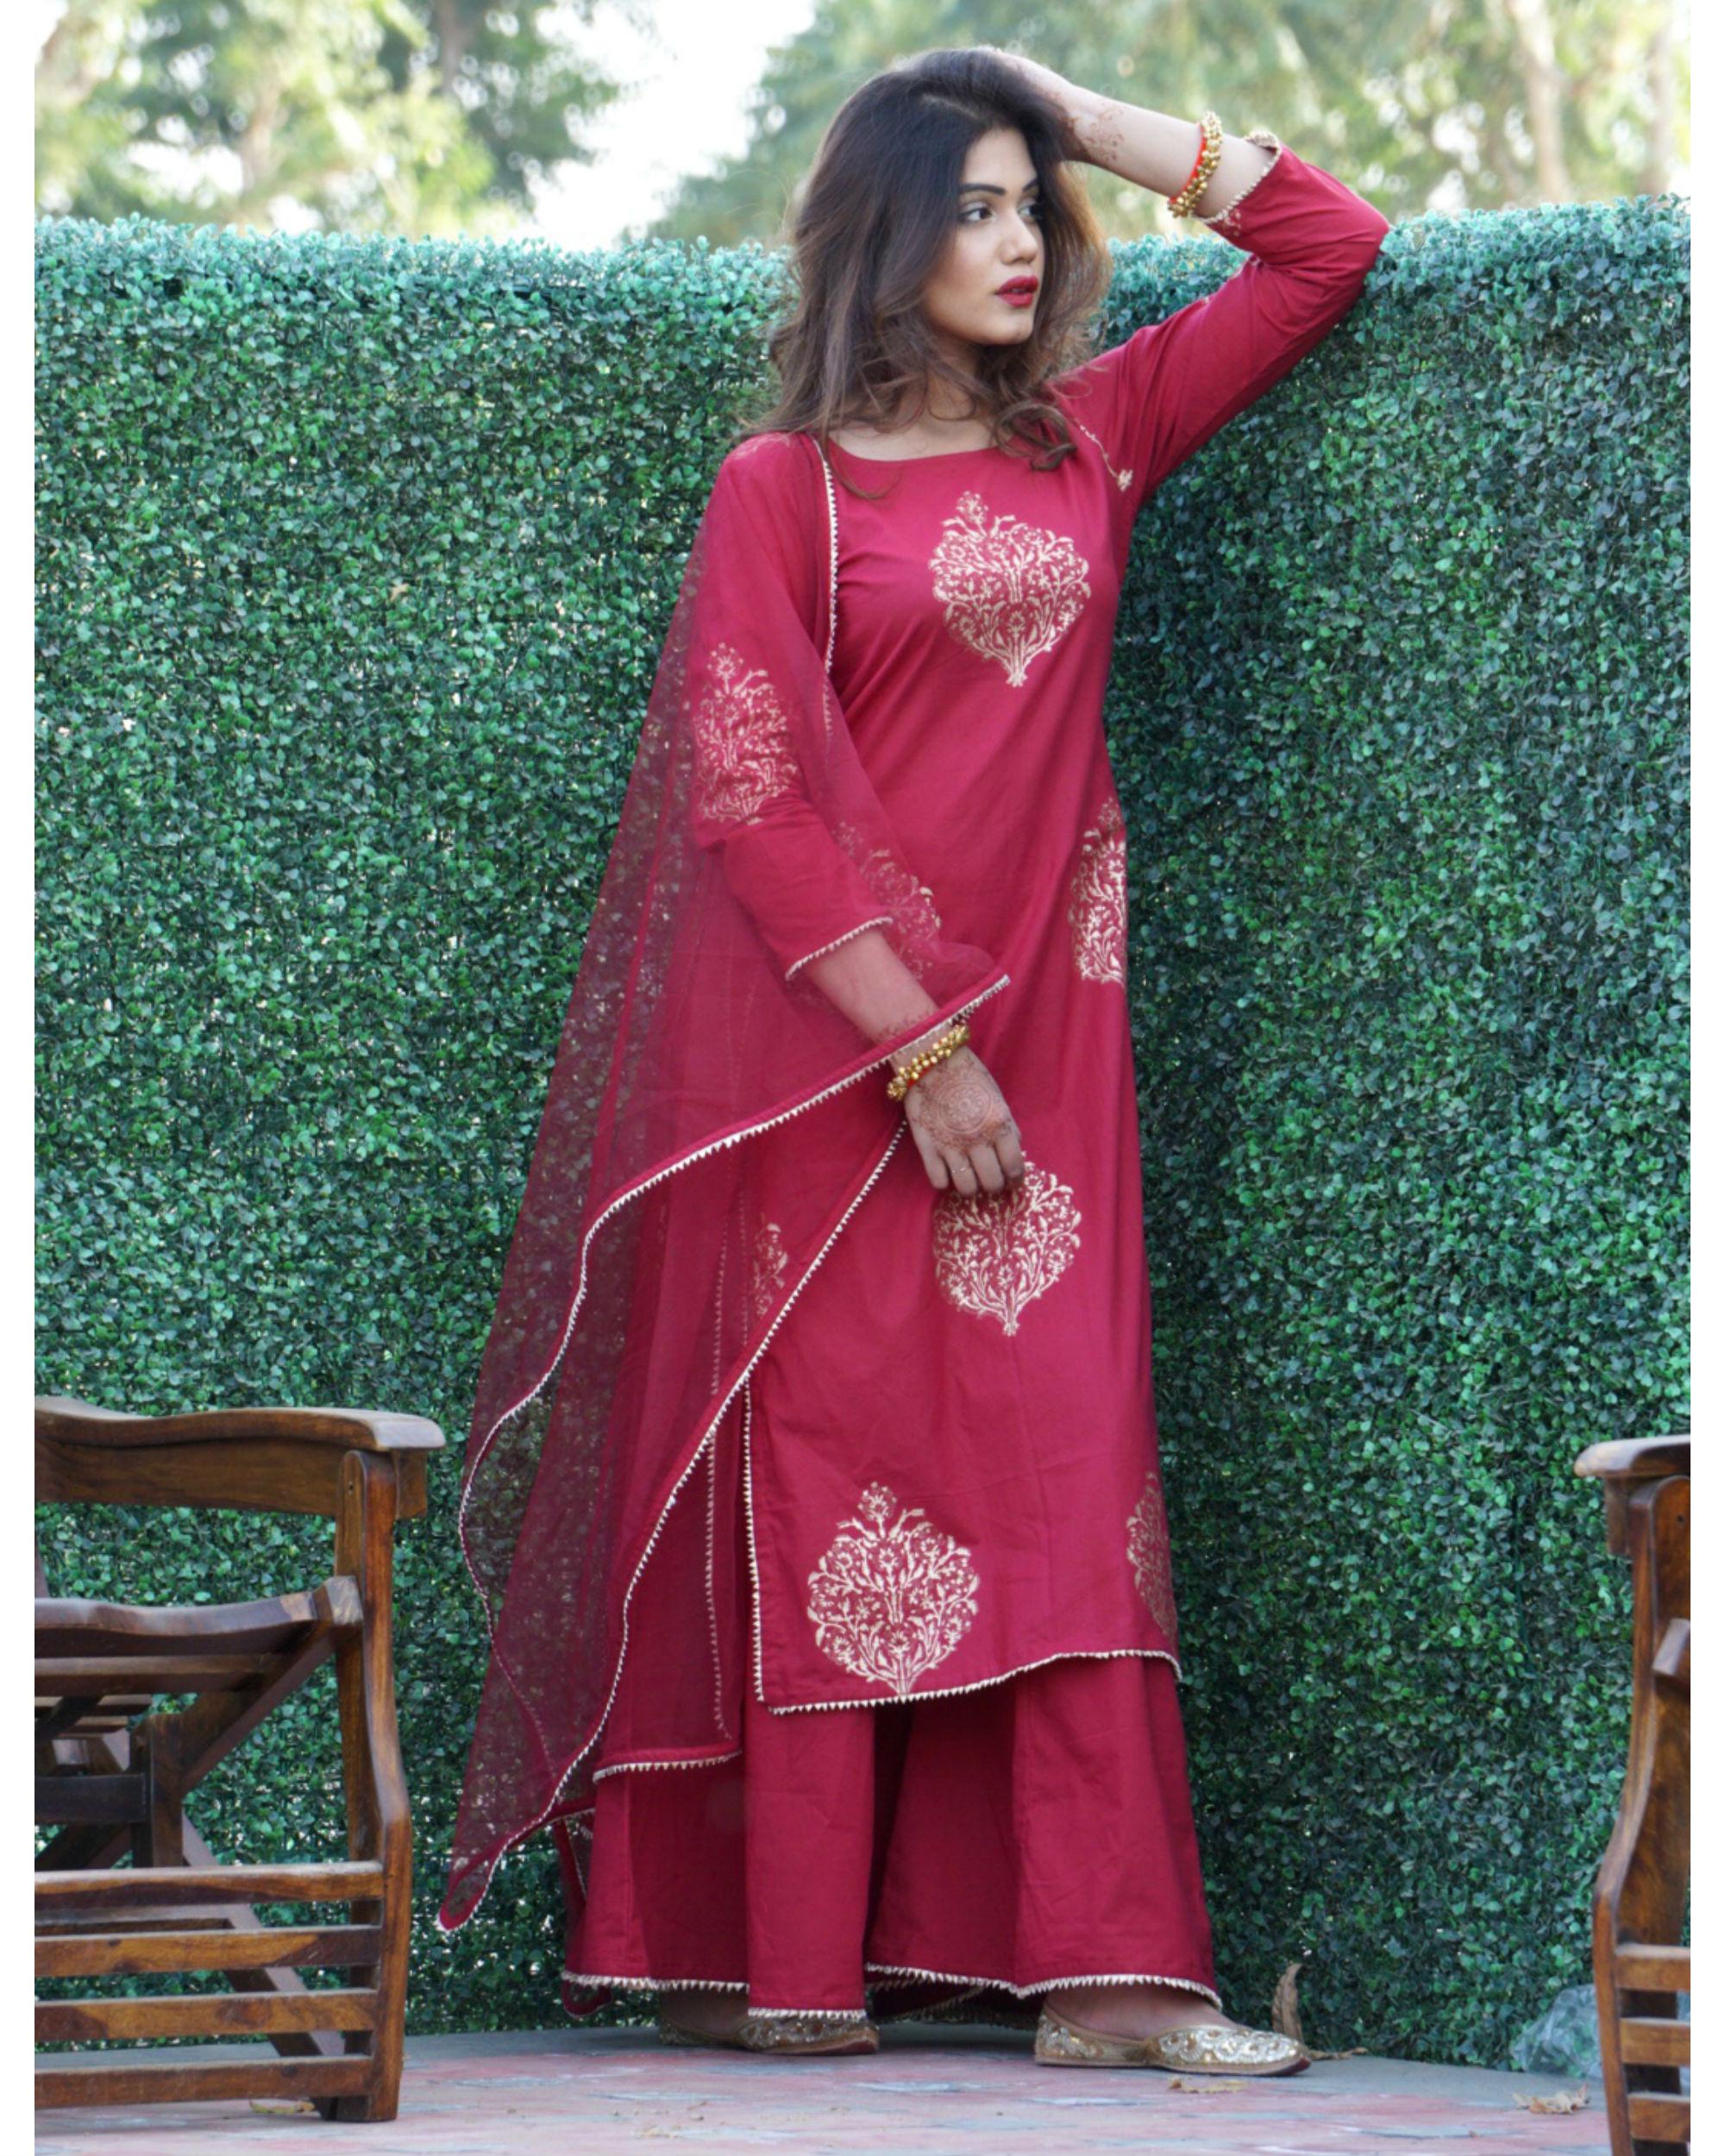 Ihram Kids For Sale Dubai: Maroon Gold Print Sharara Set With Net Dupatta By Rivaaj